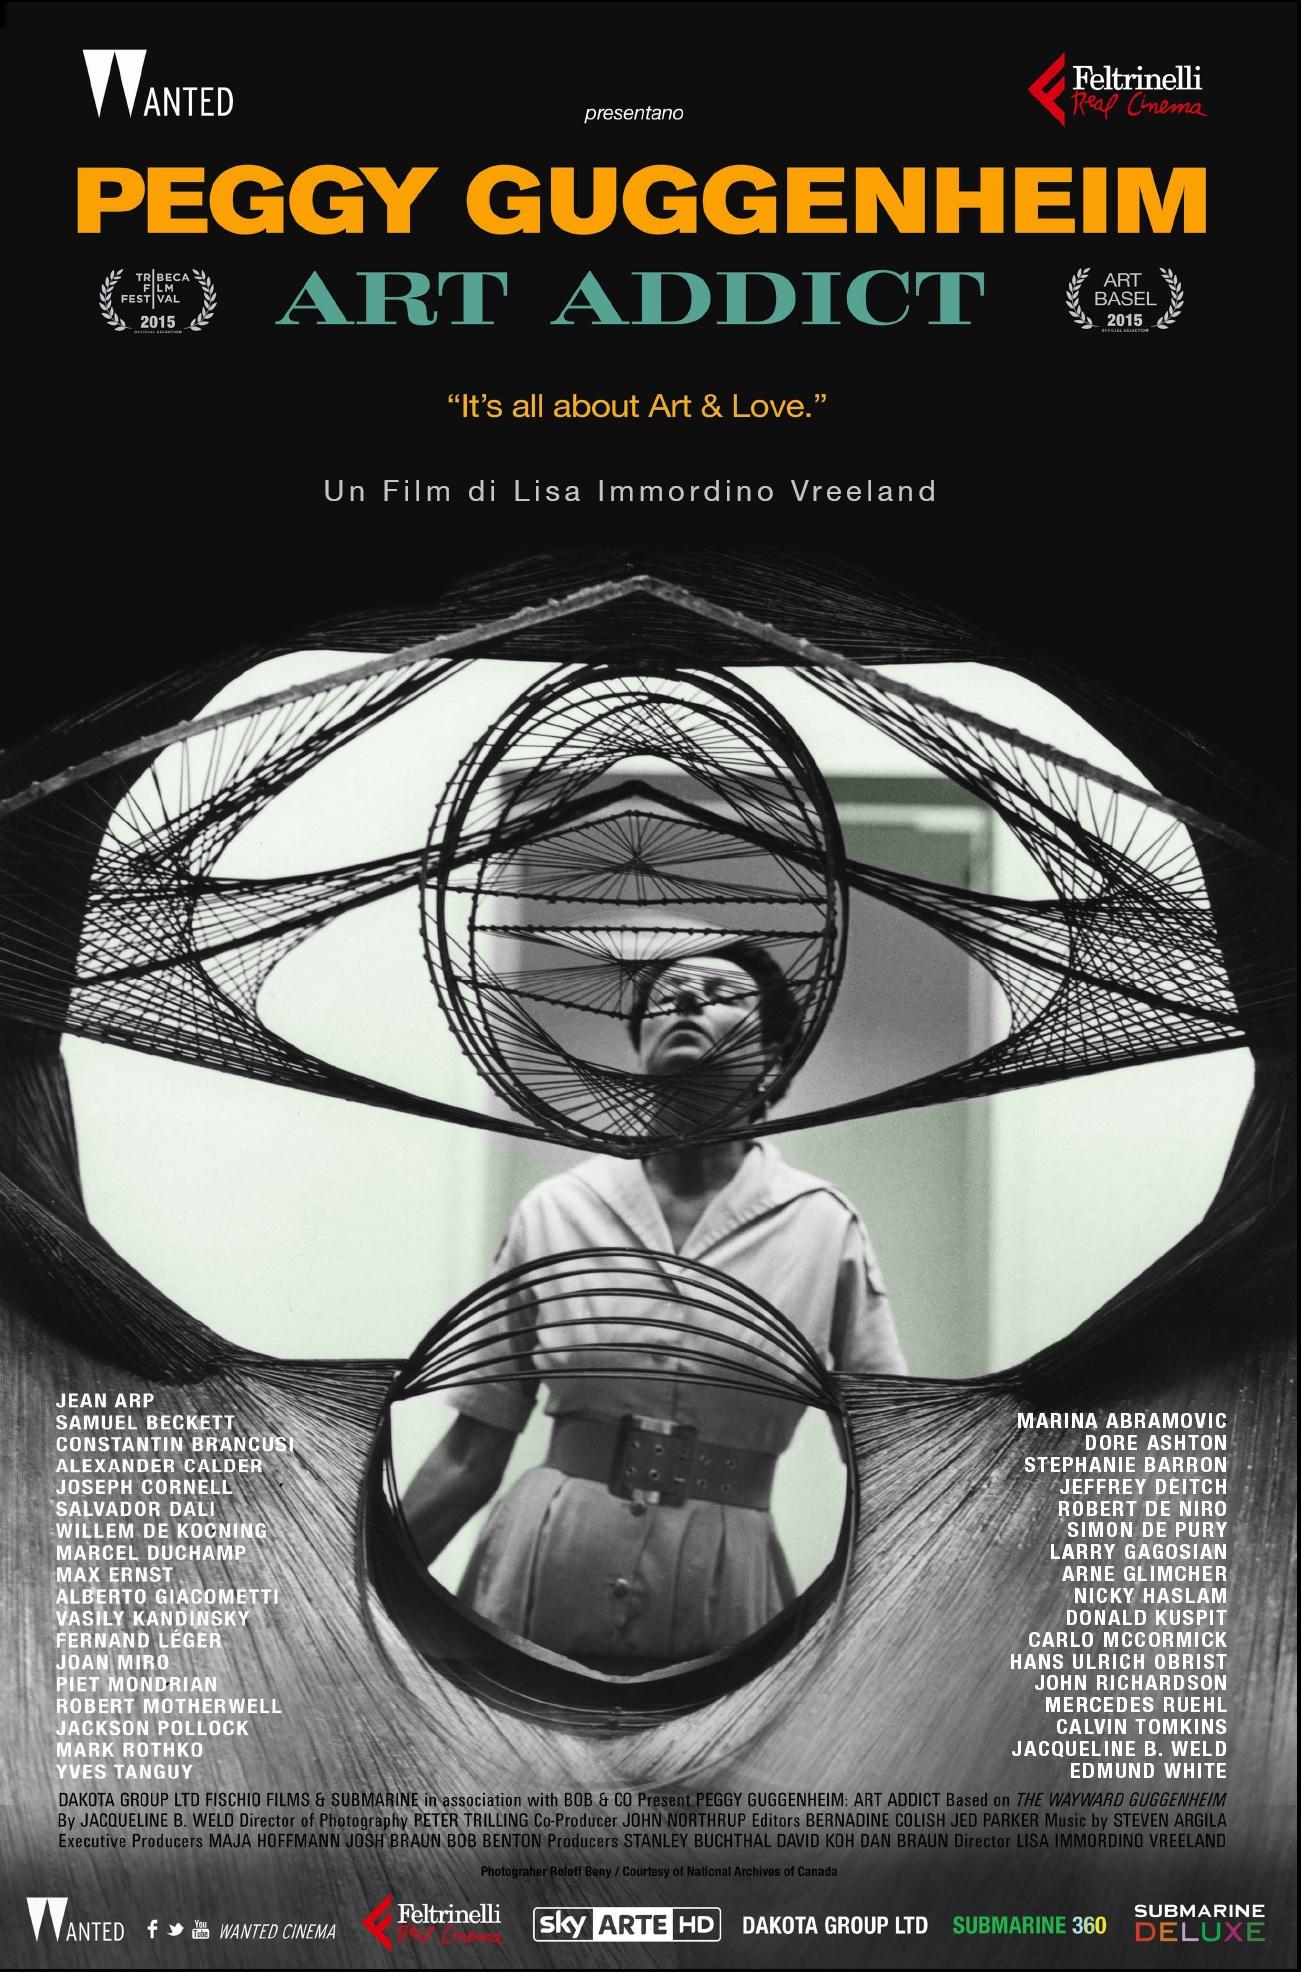 PEGGY GUGGENHEIM ART ADDICT - manifesto